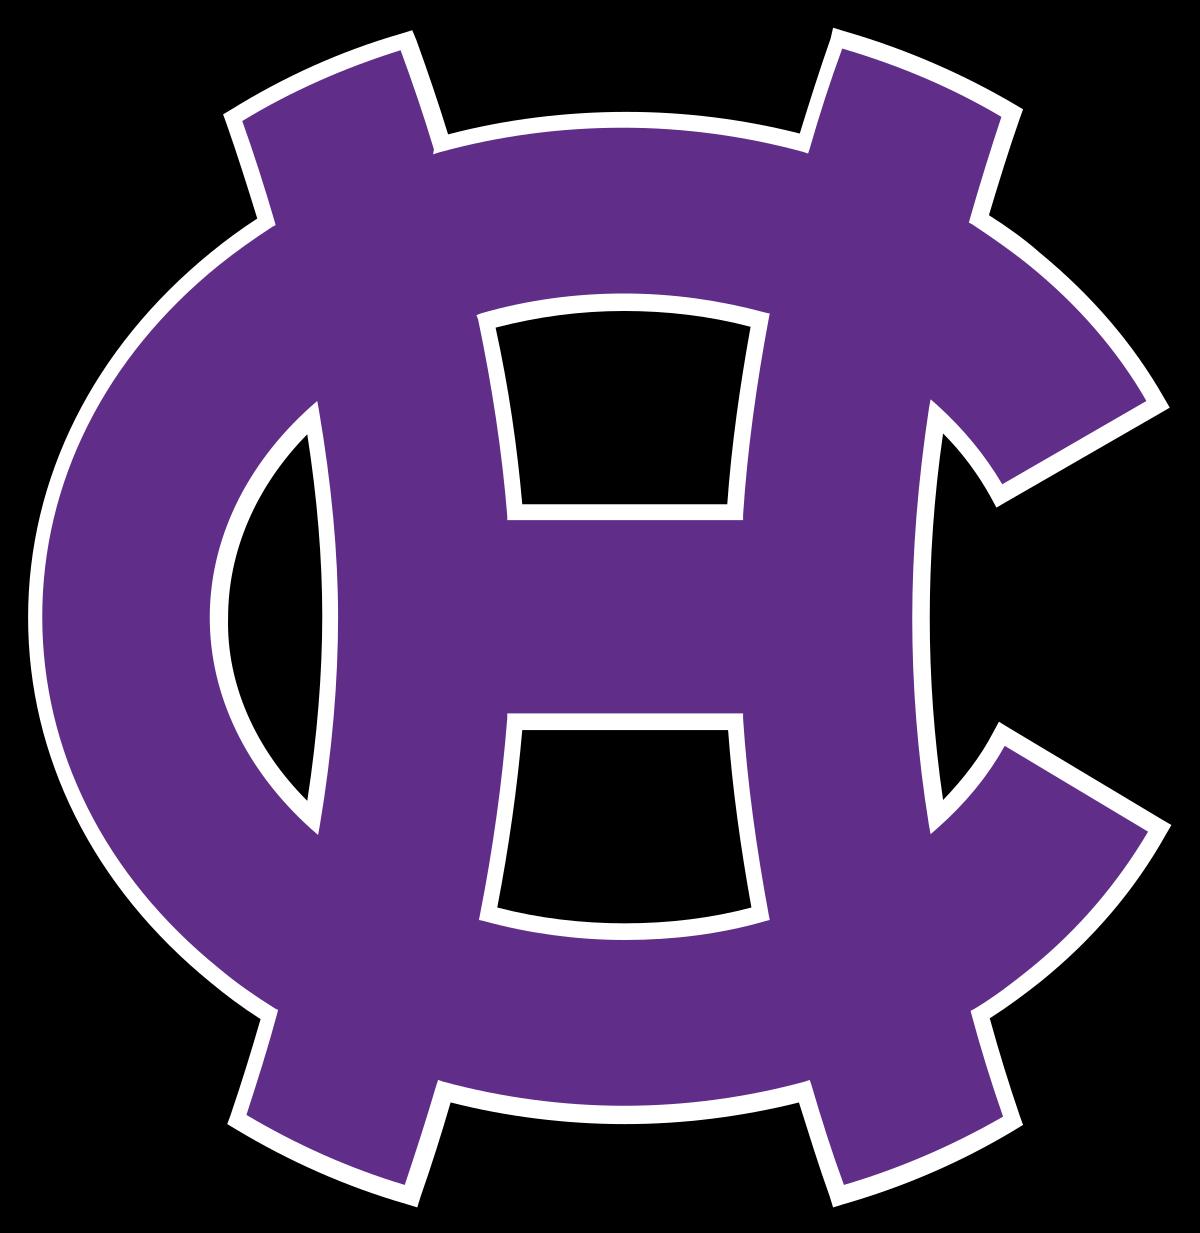 Bb cross basketball logo clipart clip royalty free library Holy Cross Crusaders men's basketball - Wikipedia clip royalty free library